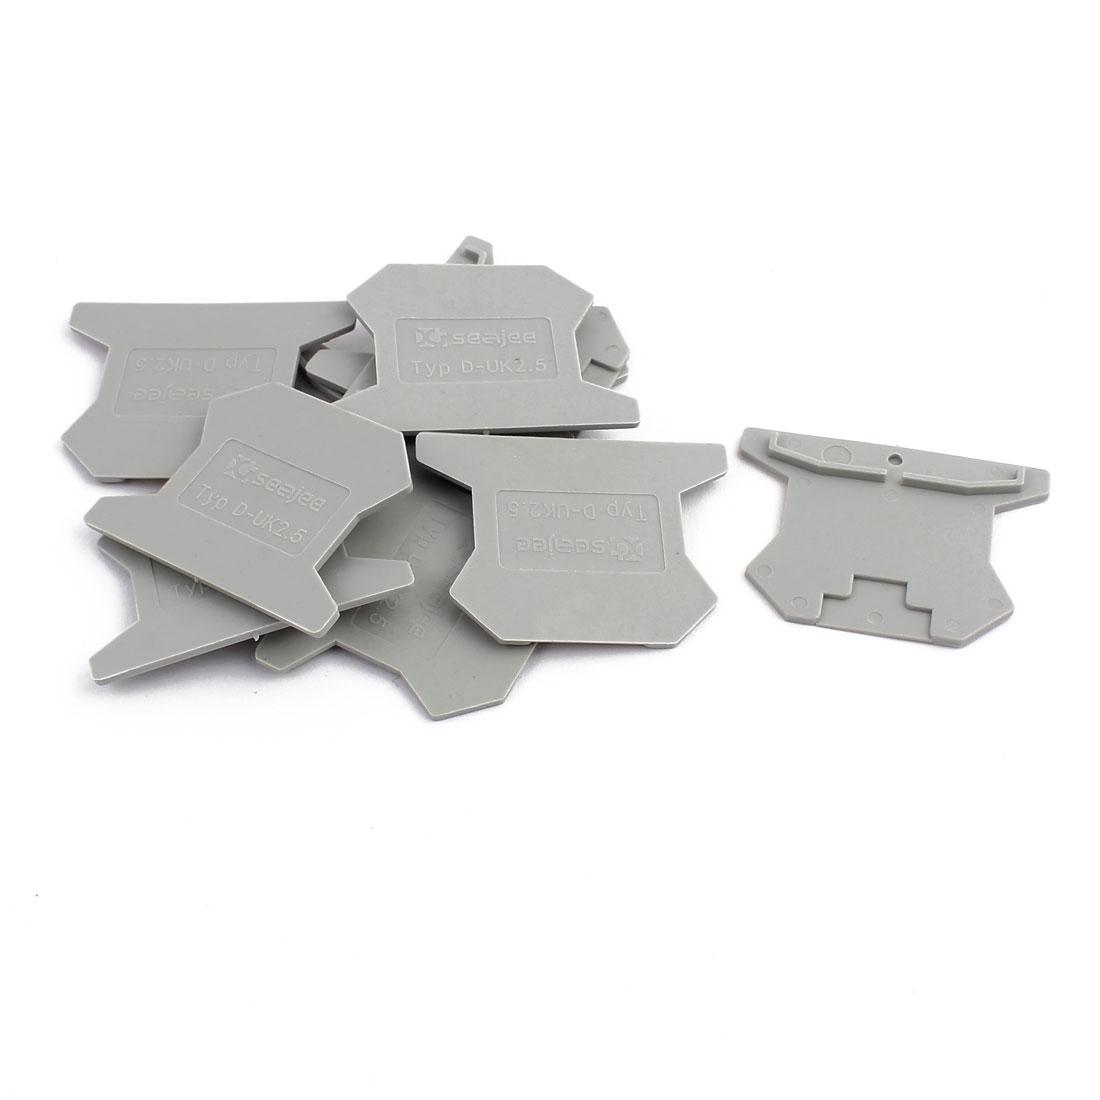 10Pcs D-UK2.5 DIN Rail Terminal Block End Plate Covers Protectors Barriers